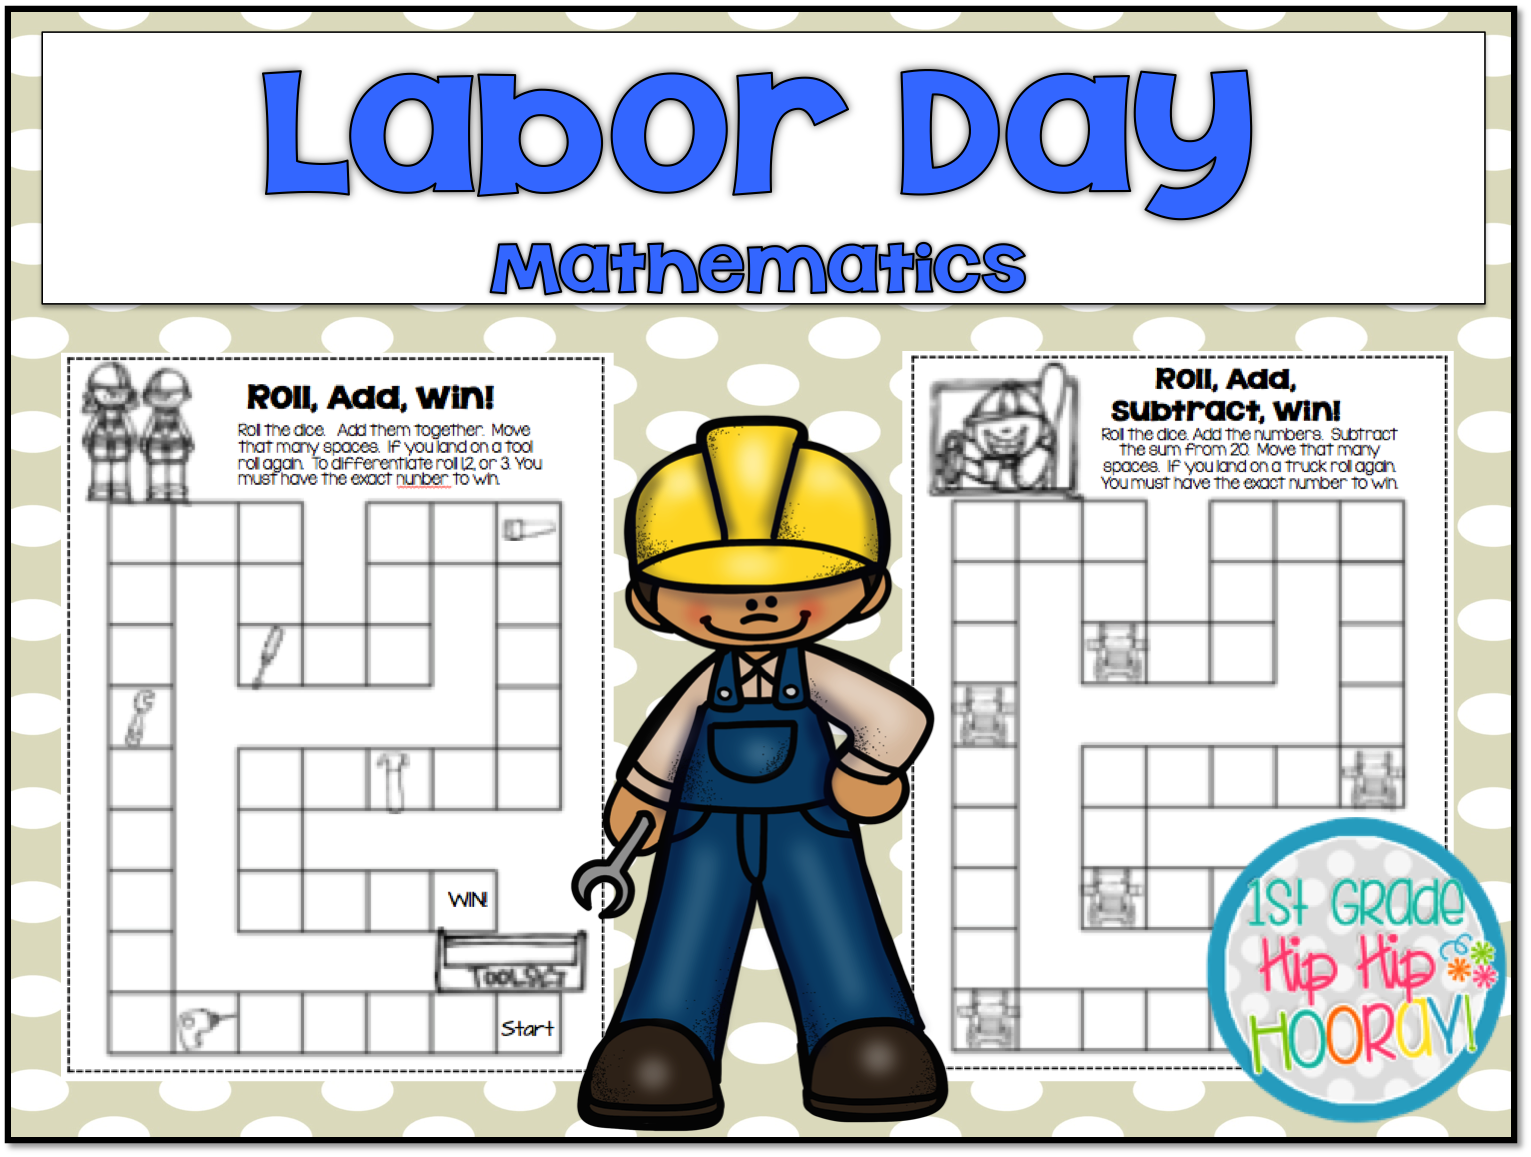 hight resolution of 1st Grade Hip Hip Hooray!: Labor Day! #morethanathreedayweekend